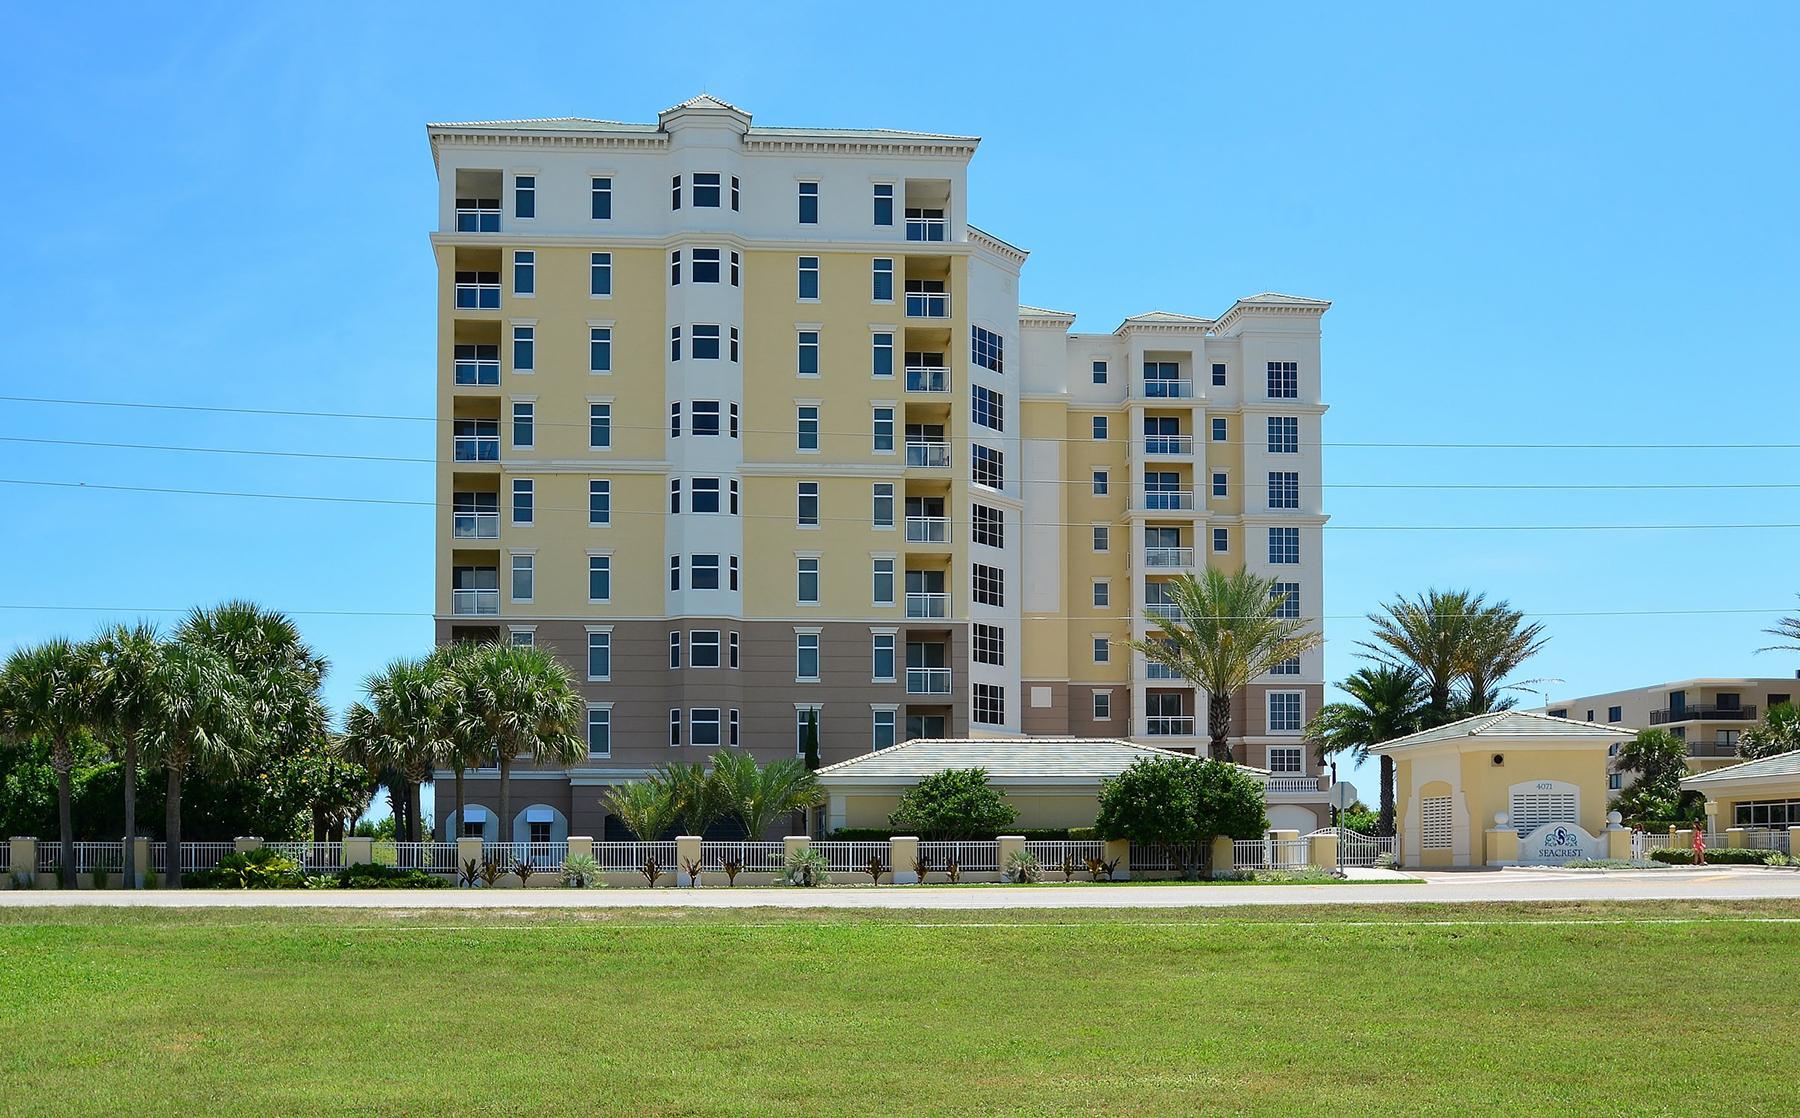 Condomínio para Venda às 4071 S Atlantic Ave , 801, New Smyrna Beach, FL 32 4071 S Atlantic Ave 801 New Smyrna Beach, Florida, 32169 Estados Unidos